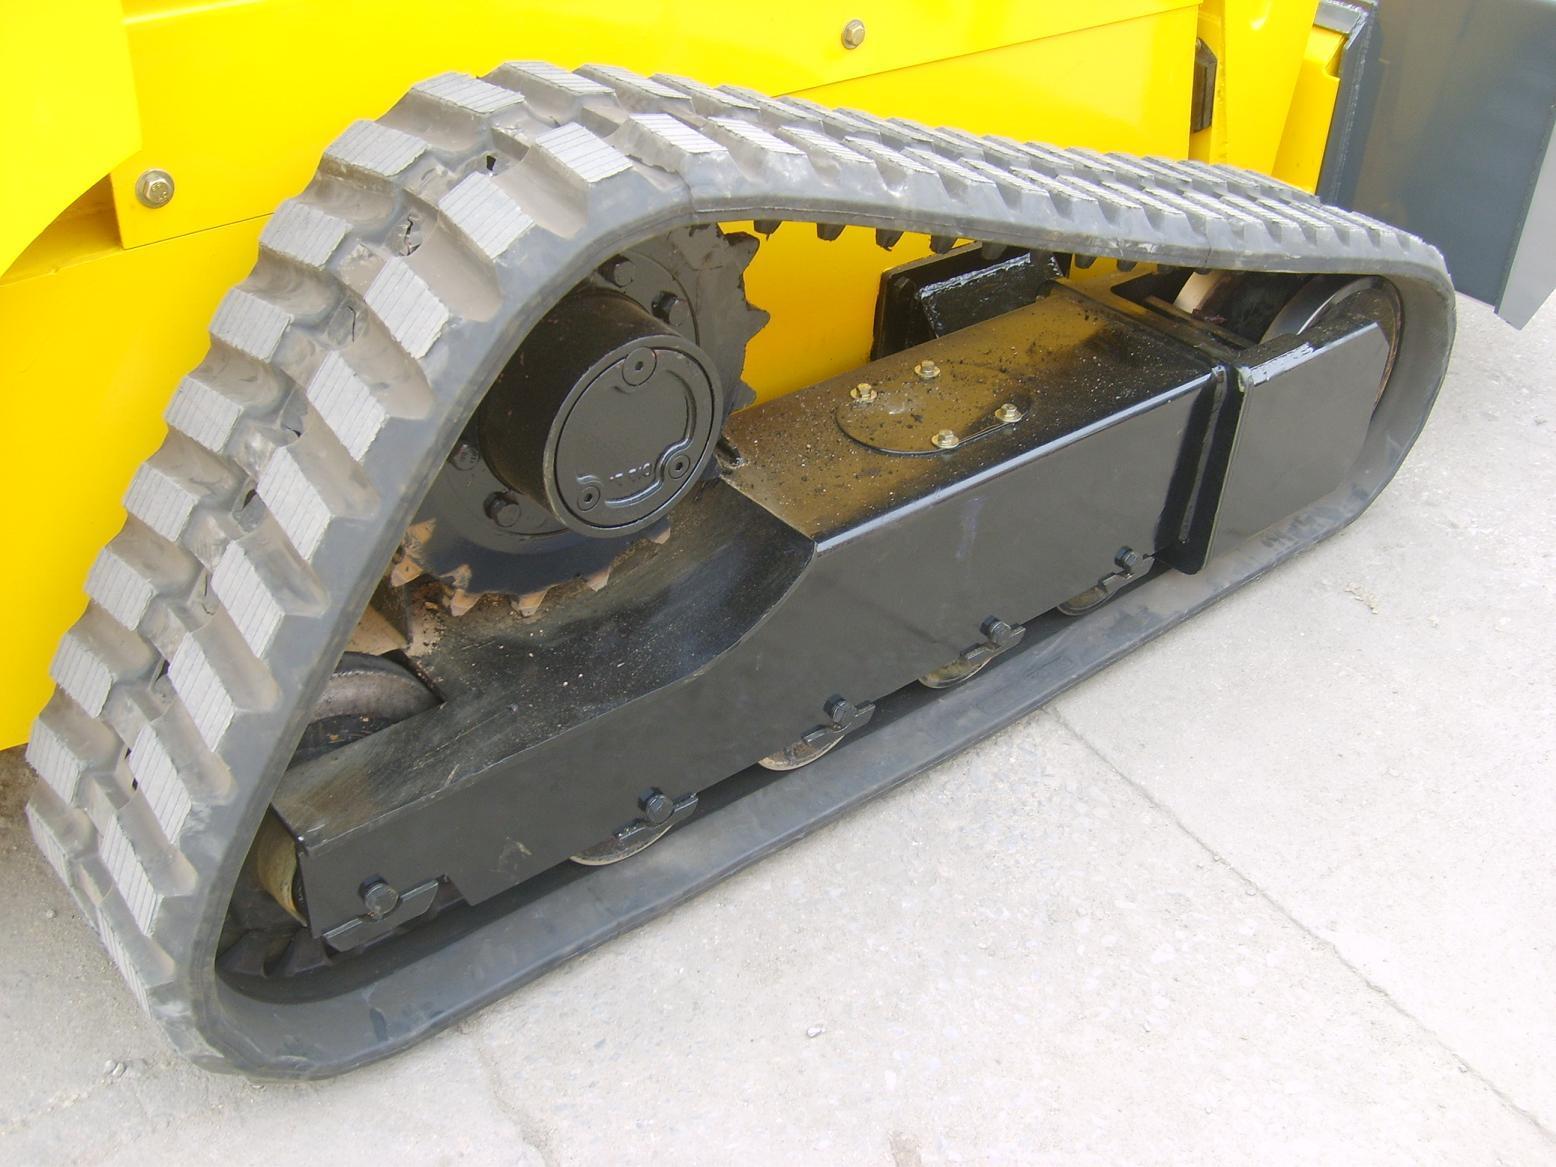 china 700 1200kg operation weight track skid steer loader china